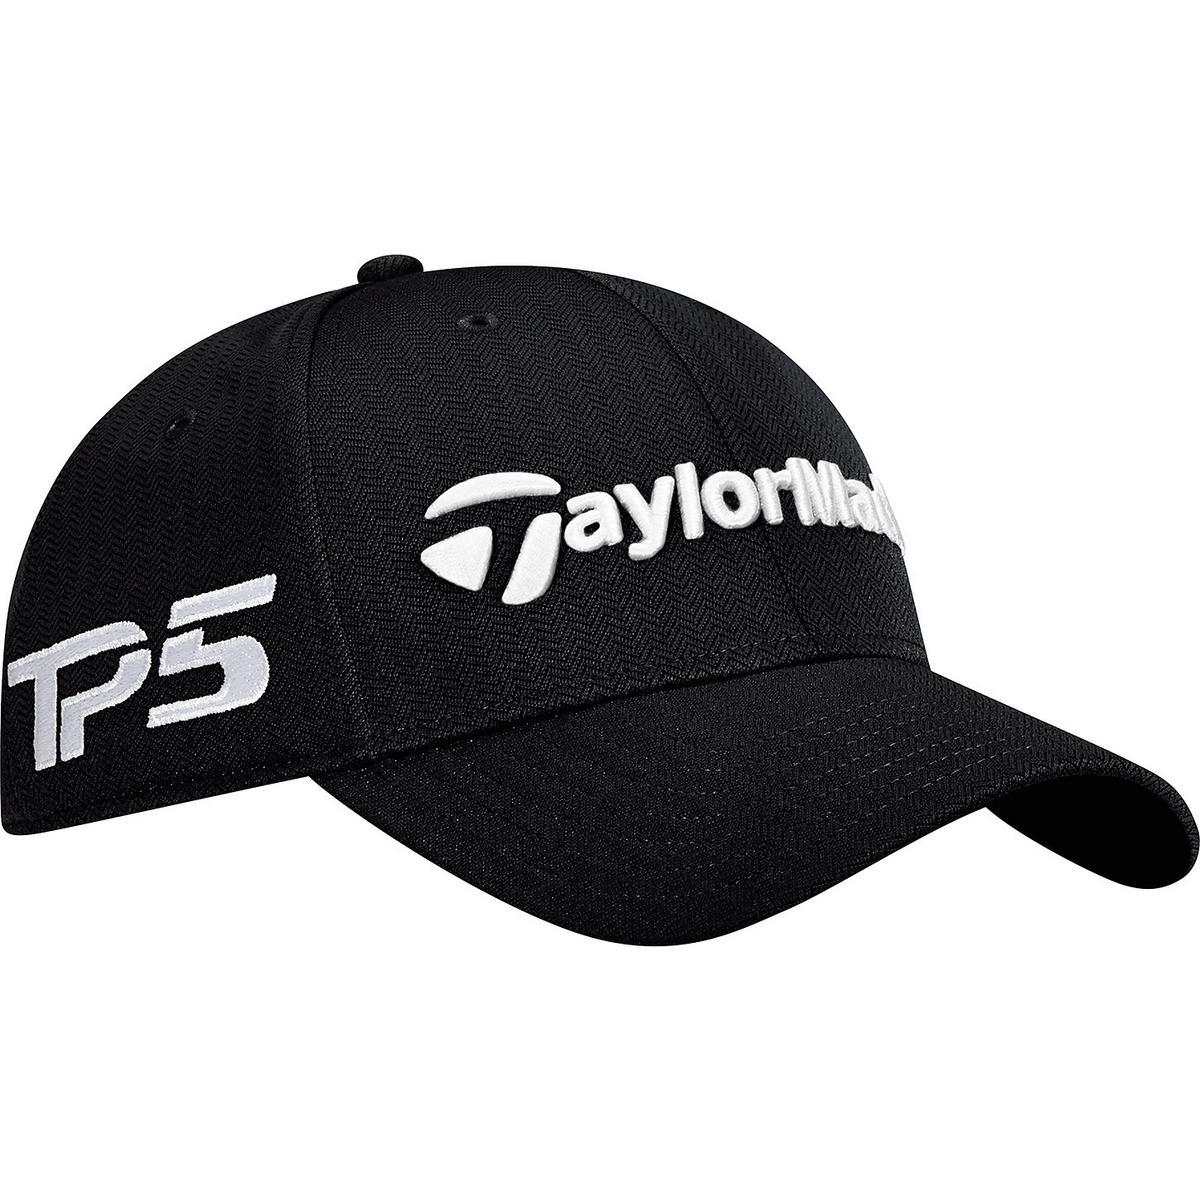 8112f7fe071 Men s Tour Radar Adjustable Cap   Golf Town Limited